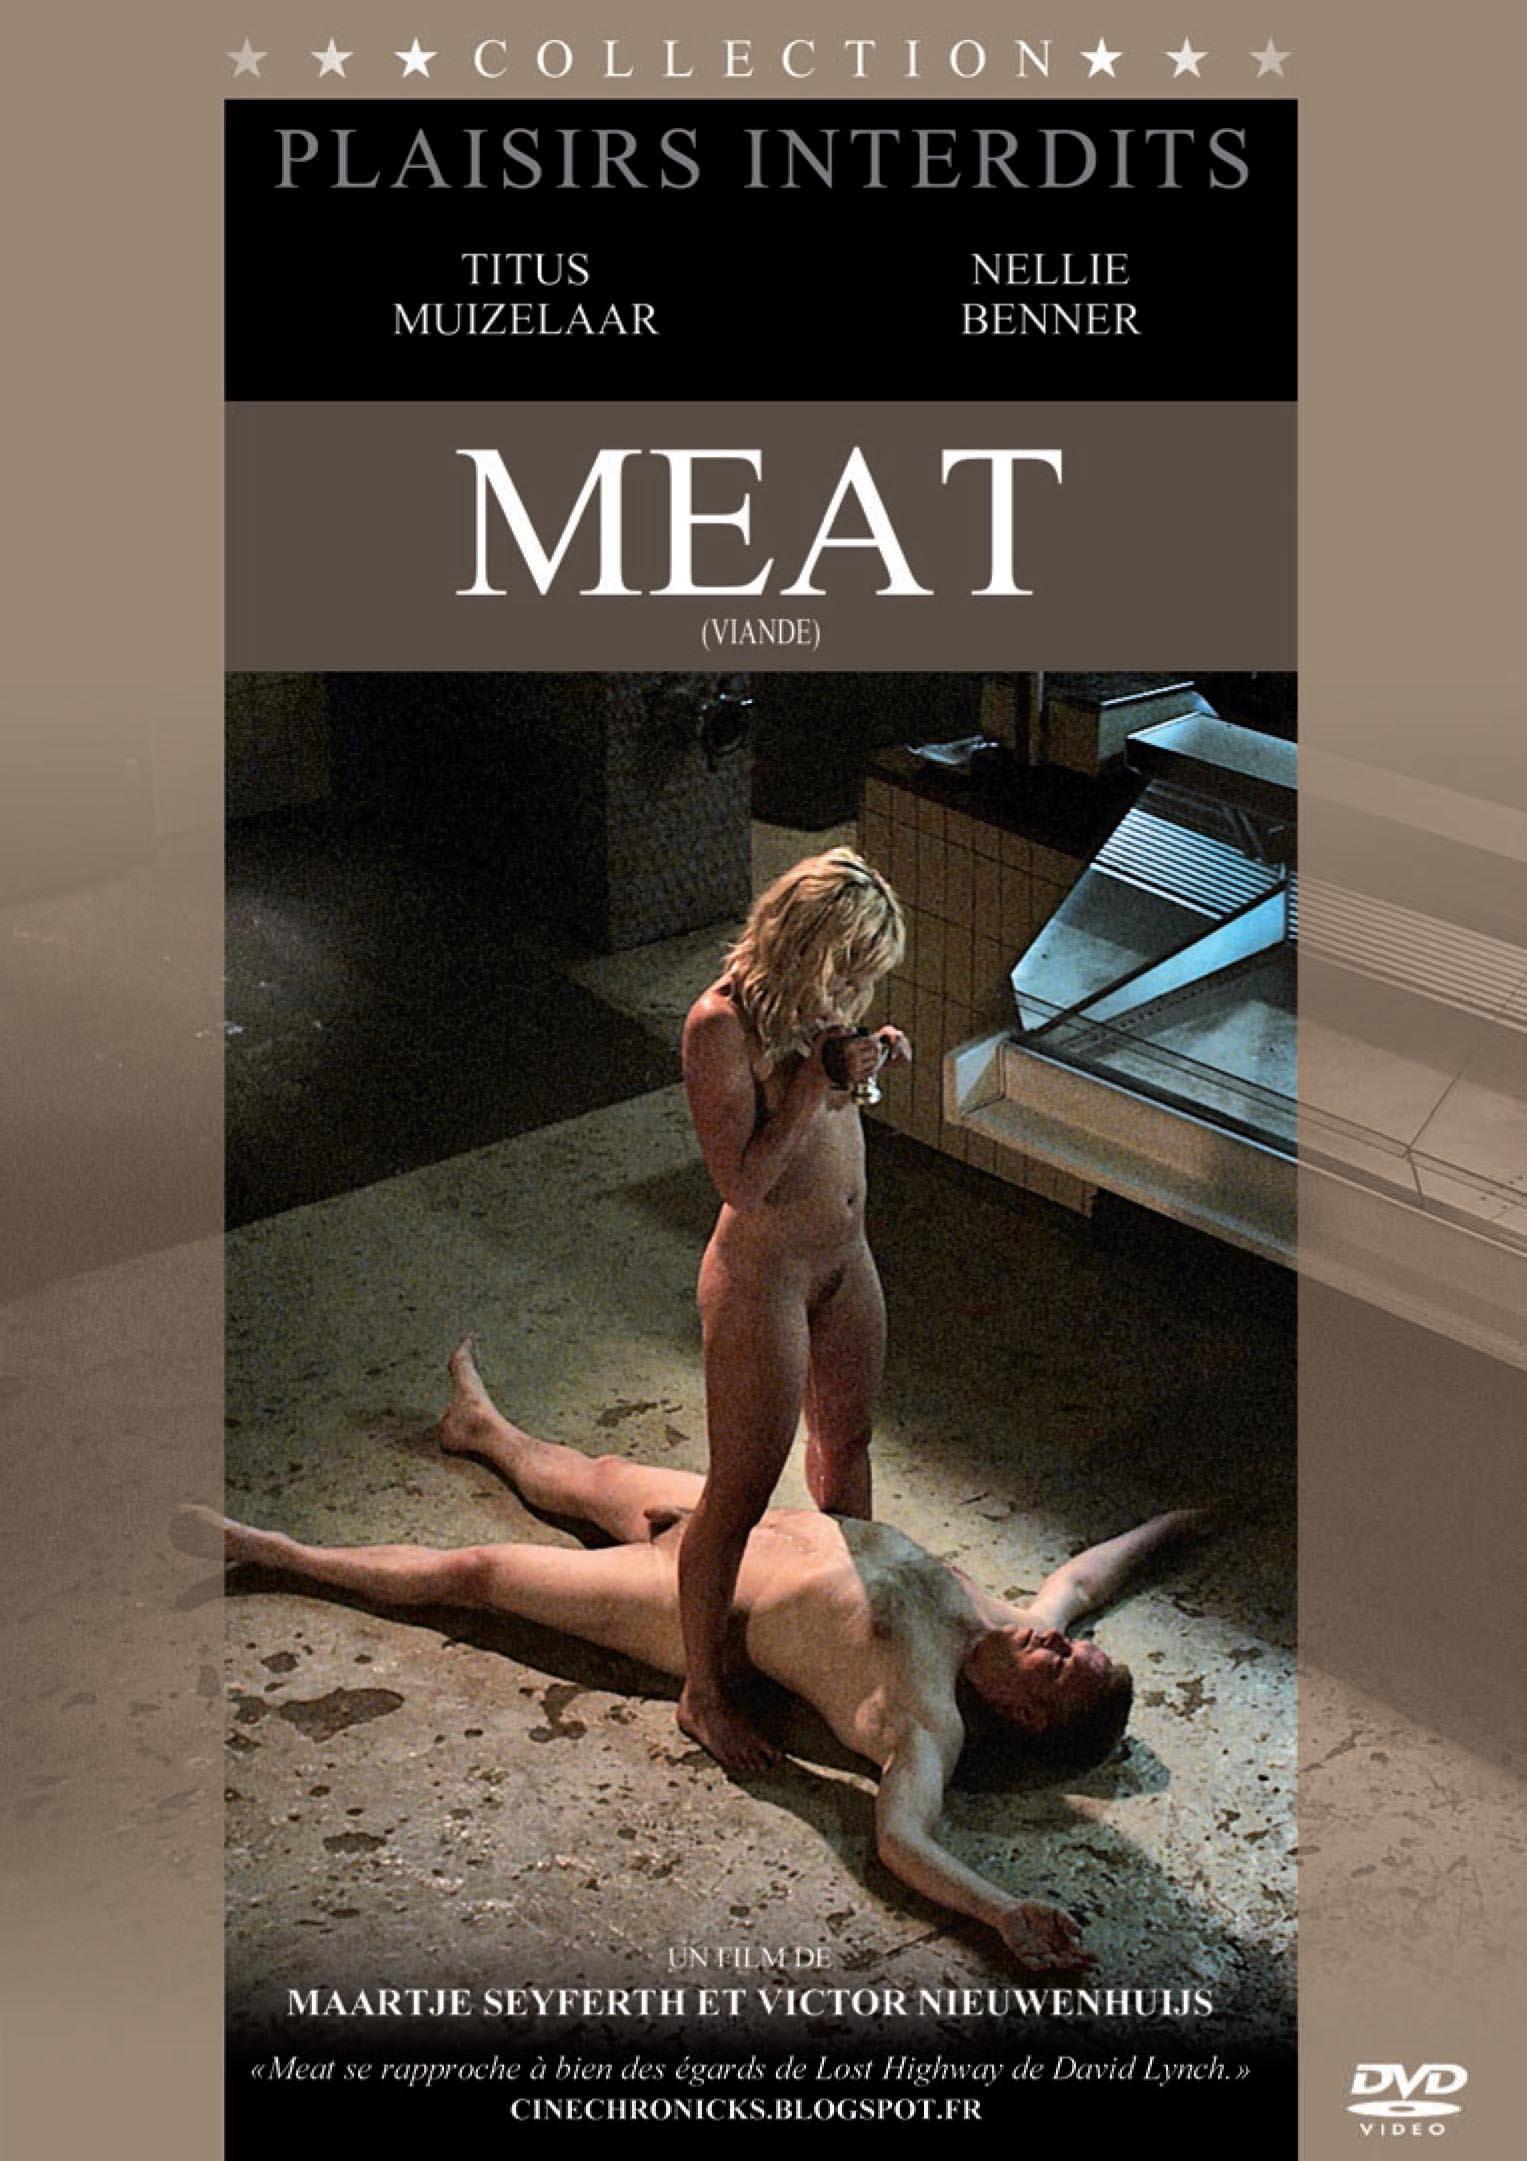 Meat – plaisirs interdits - dvd